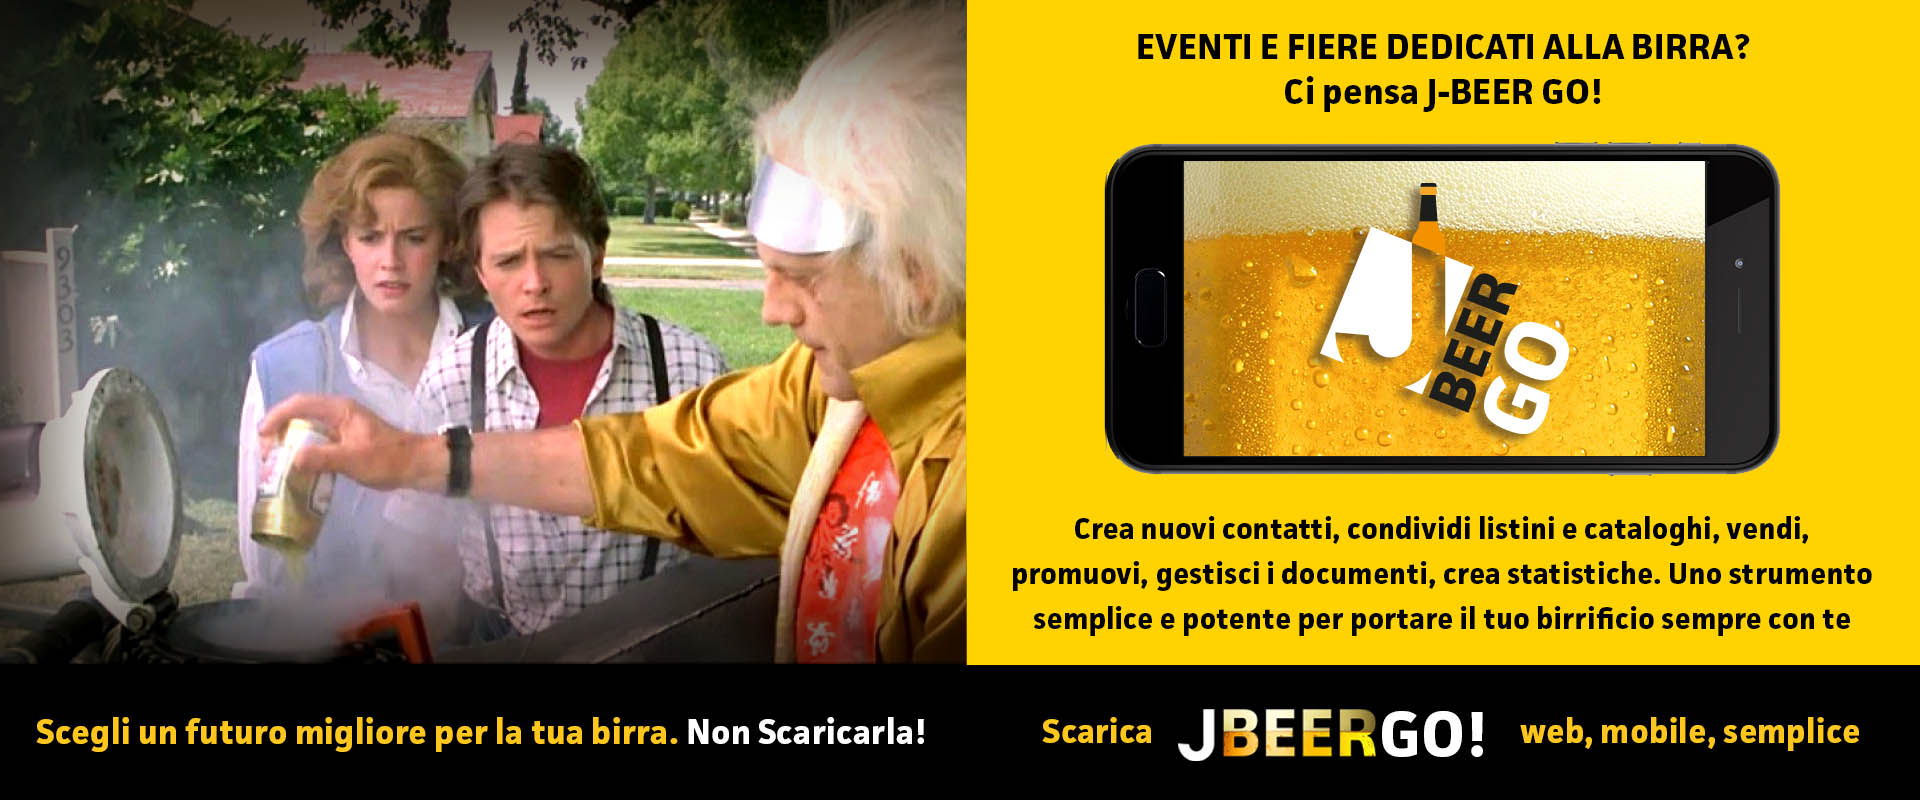 J-BEER GO! – L'APP PER EVENTI E FIERE